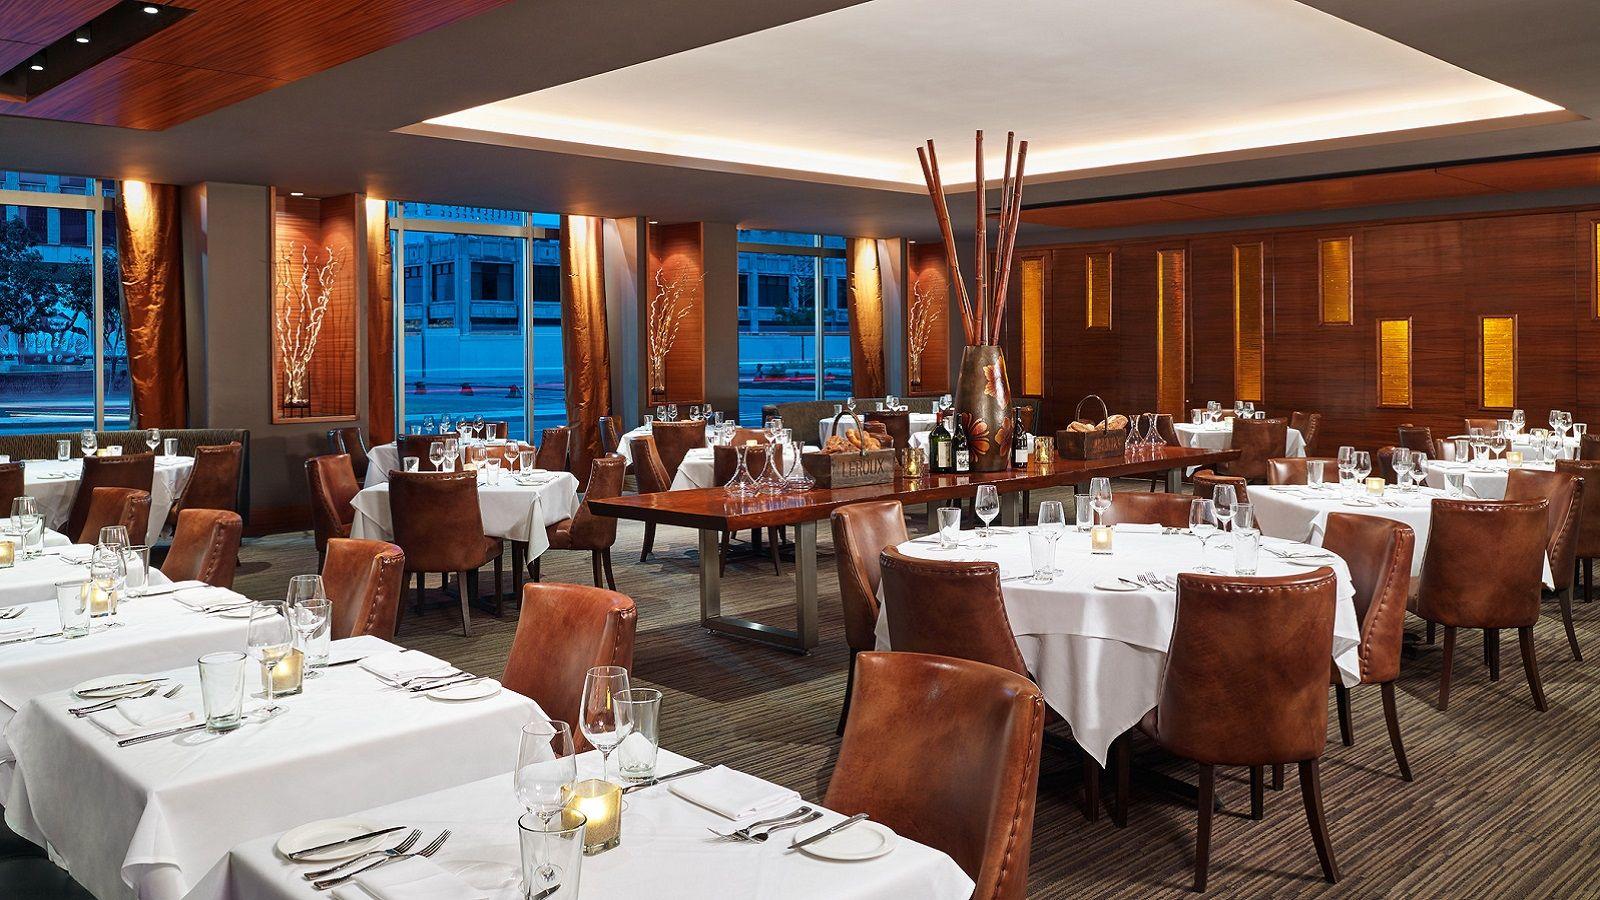 Downtown Detroit Restaurants The Westin Book Cadillac